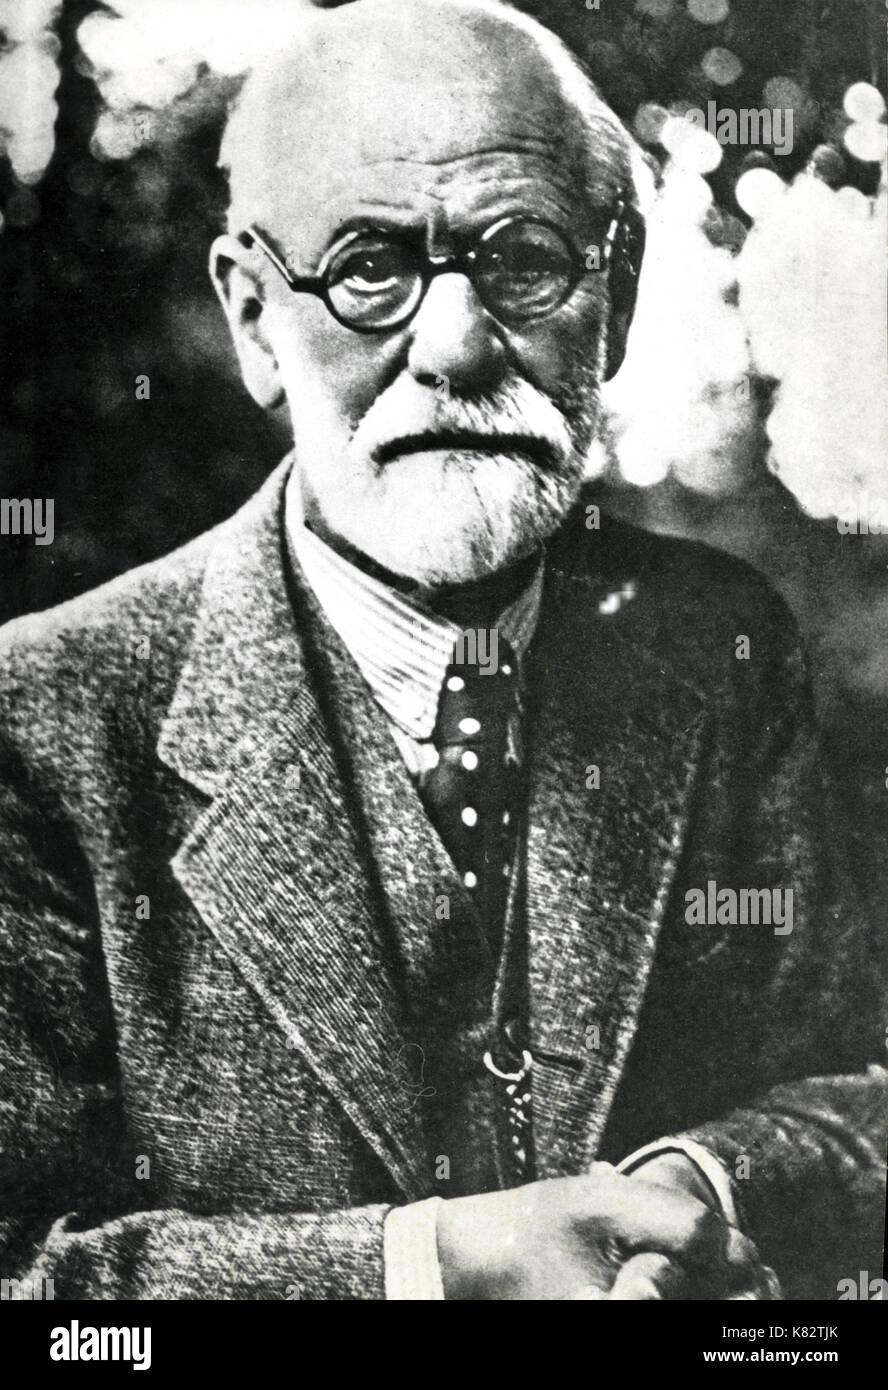 sigmund freud, 1939 - Stock Image